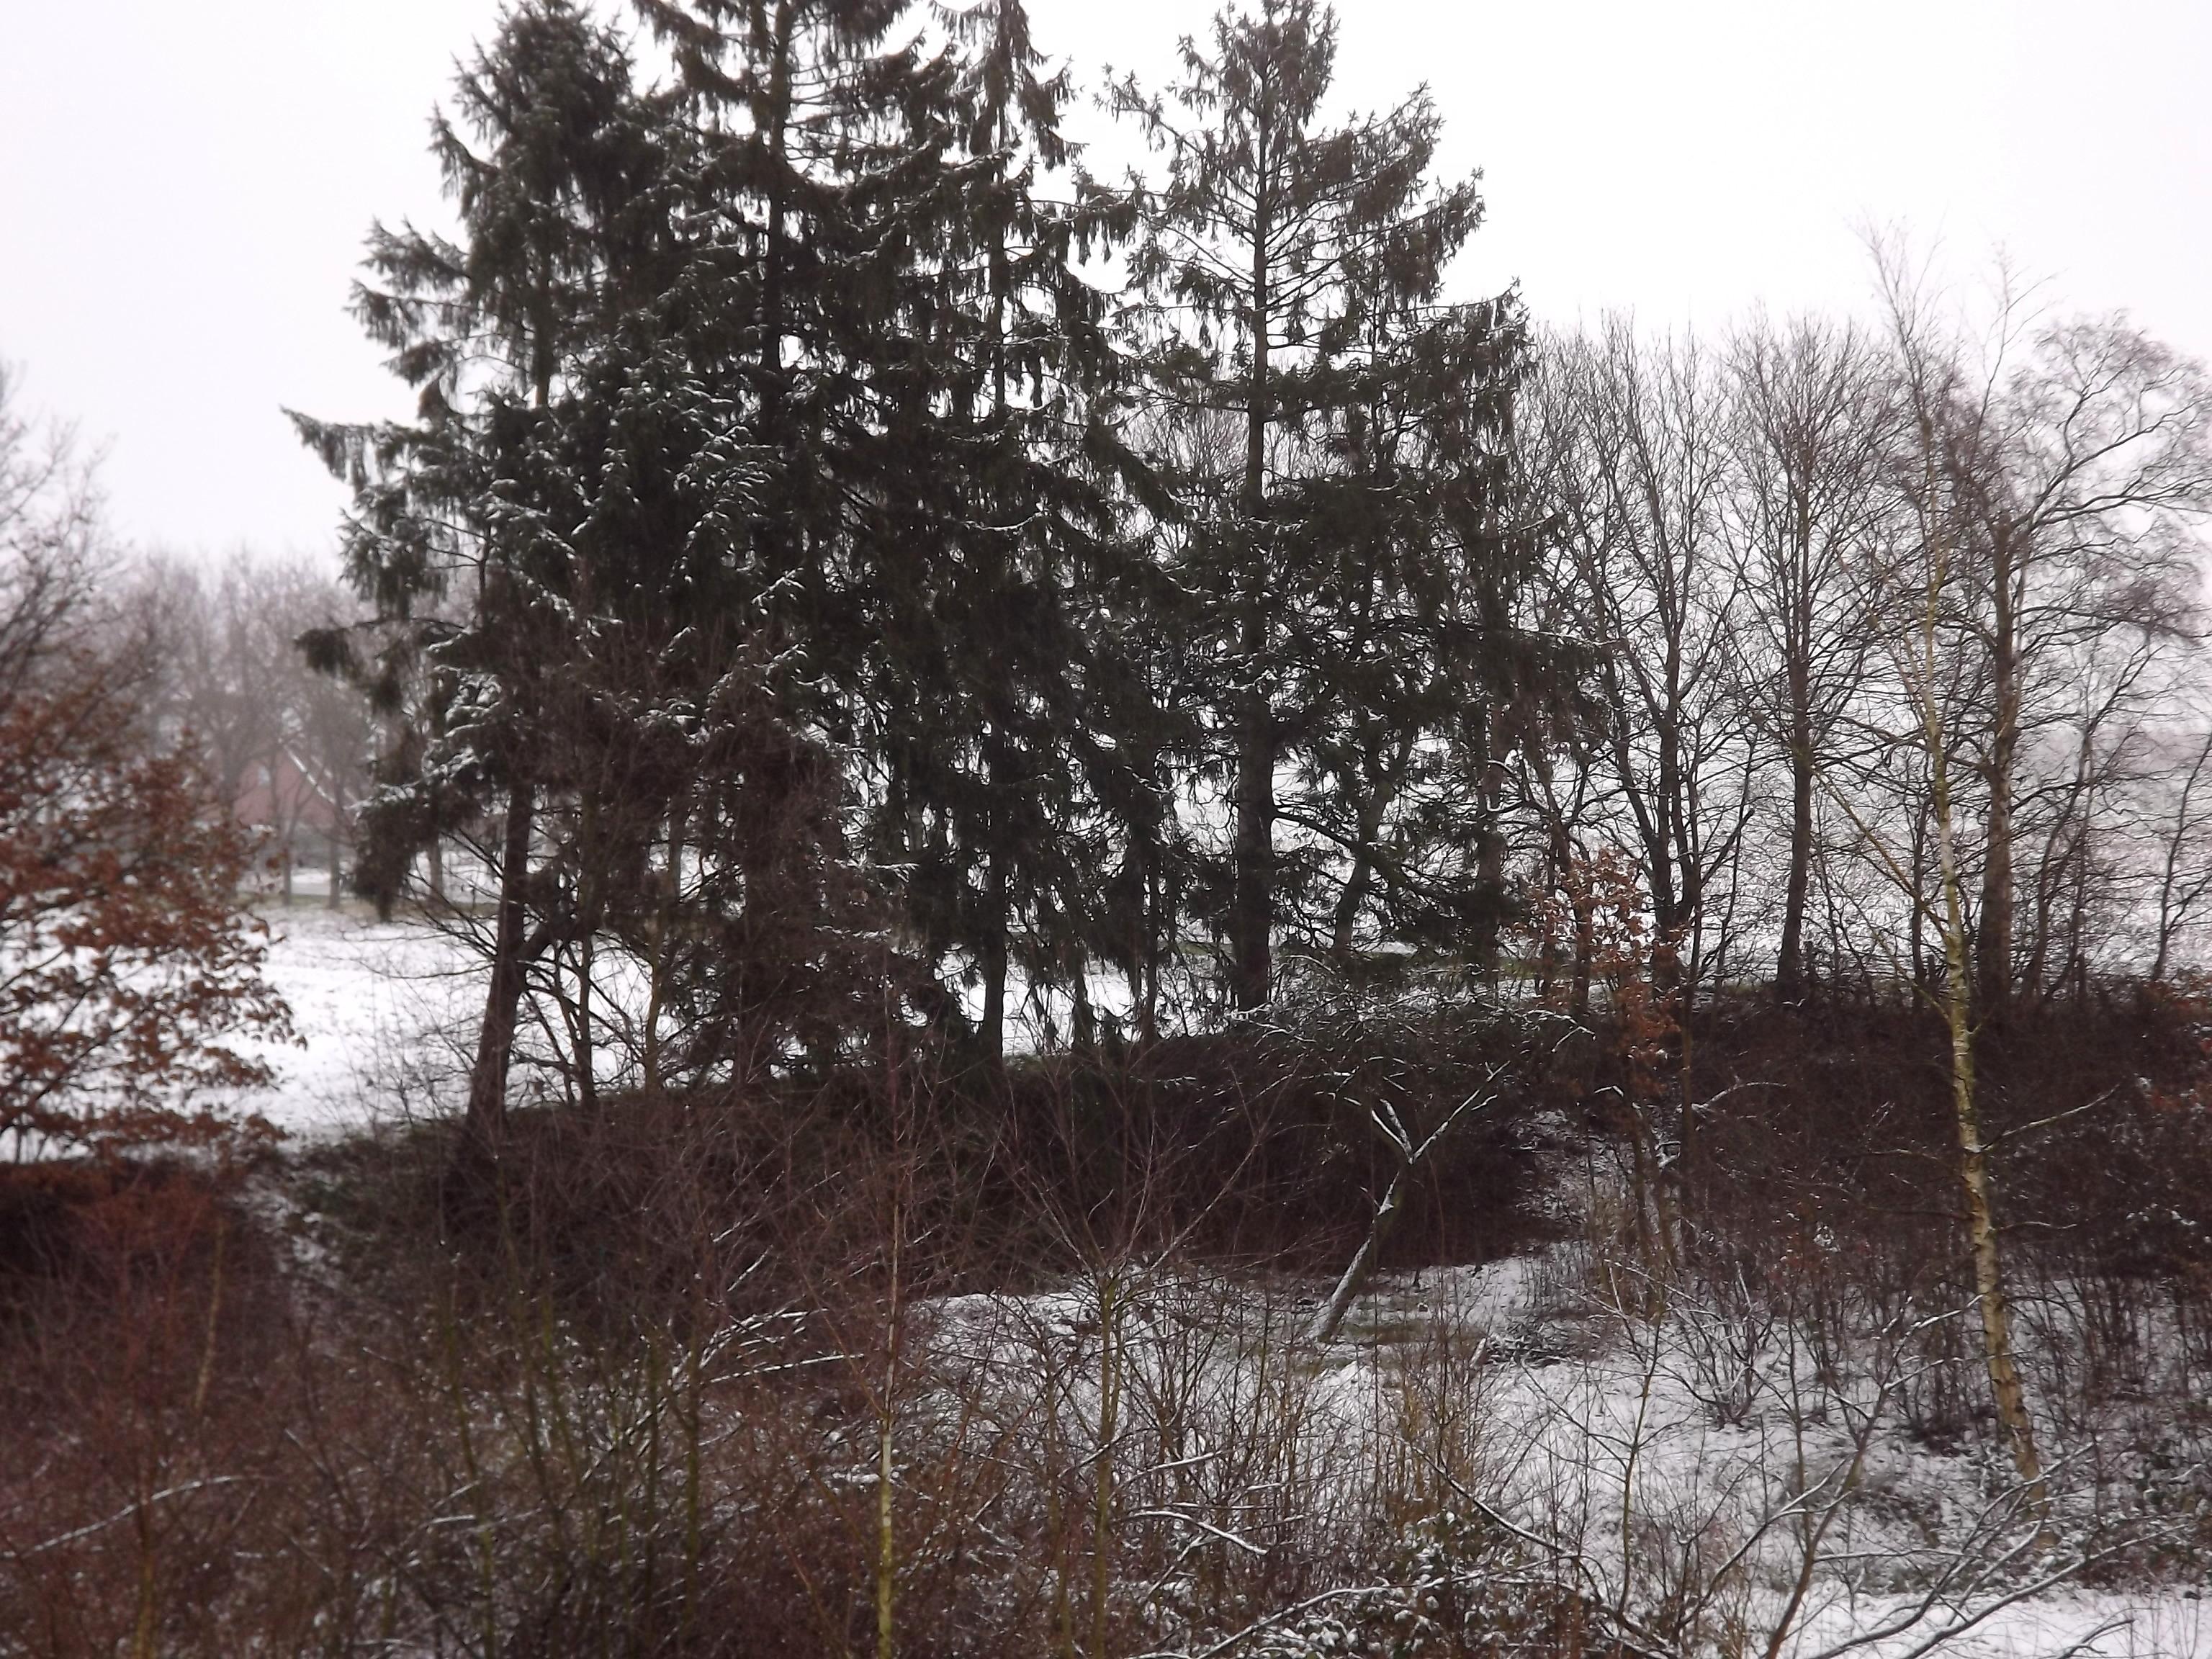 6907-winter-schnee-baeume